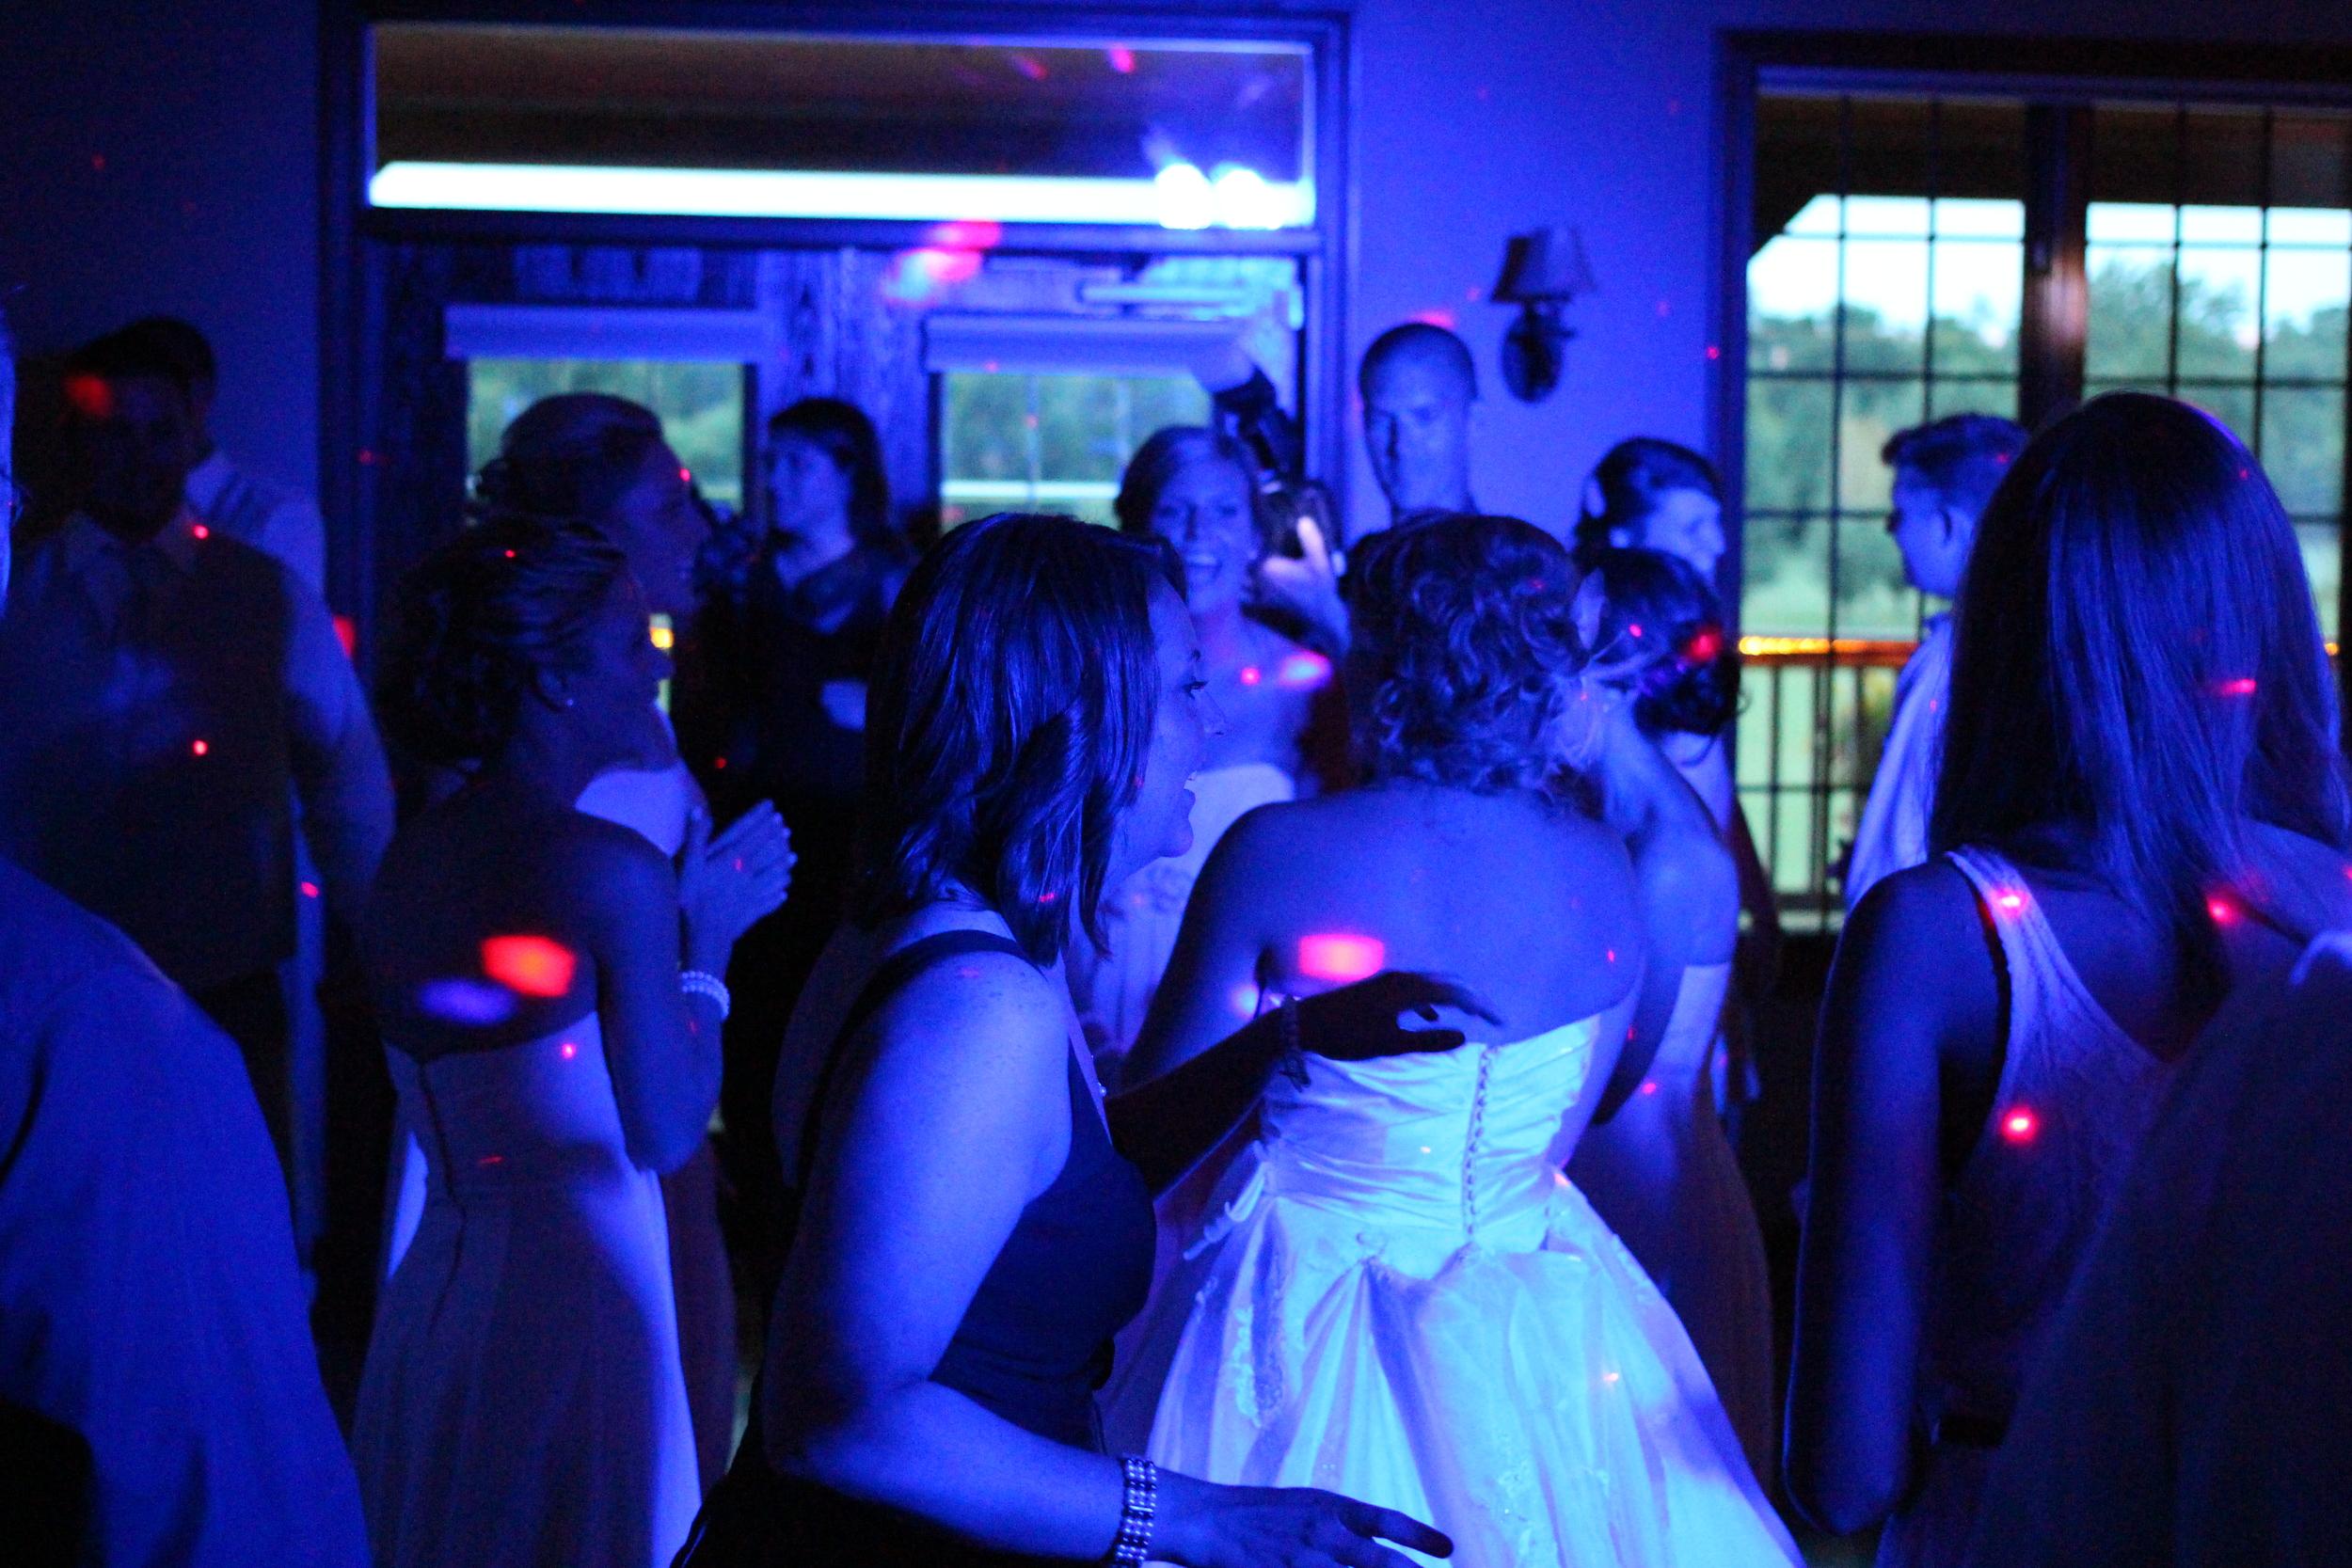 Sure Tones Entertainment   blue wash lights with active effect lights